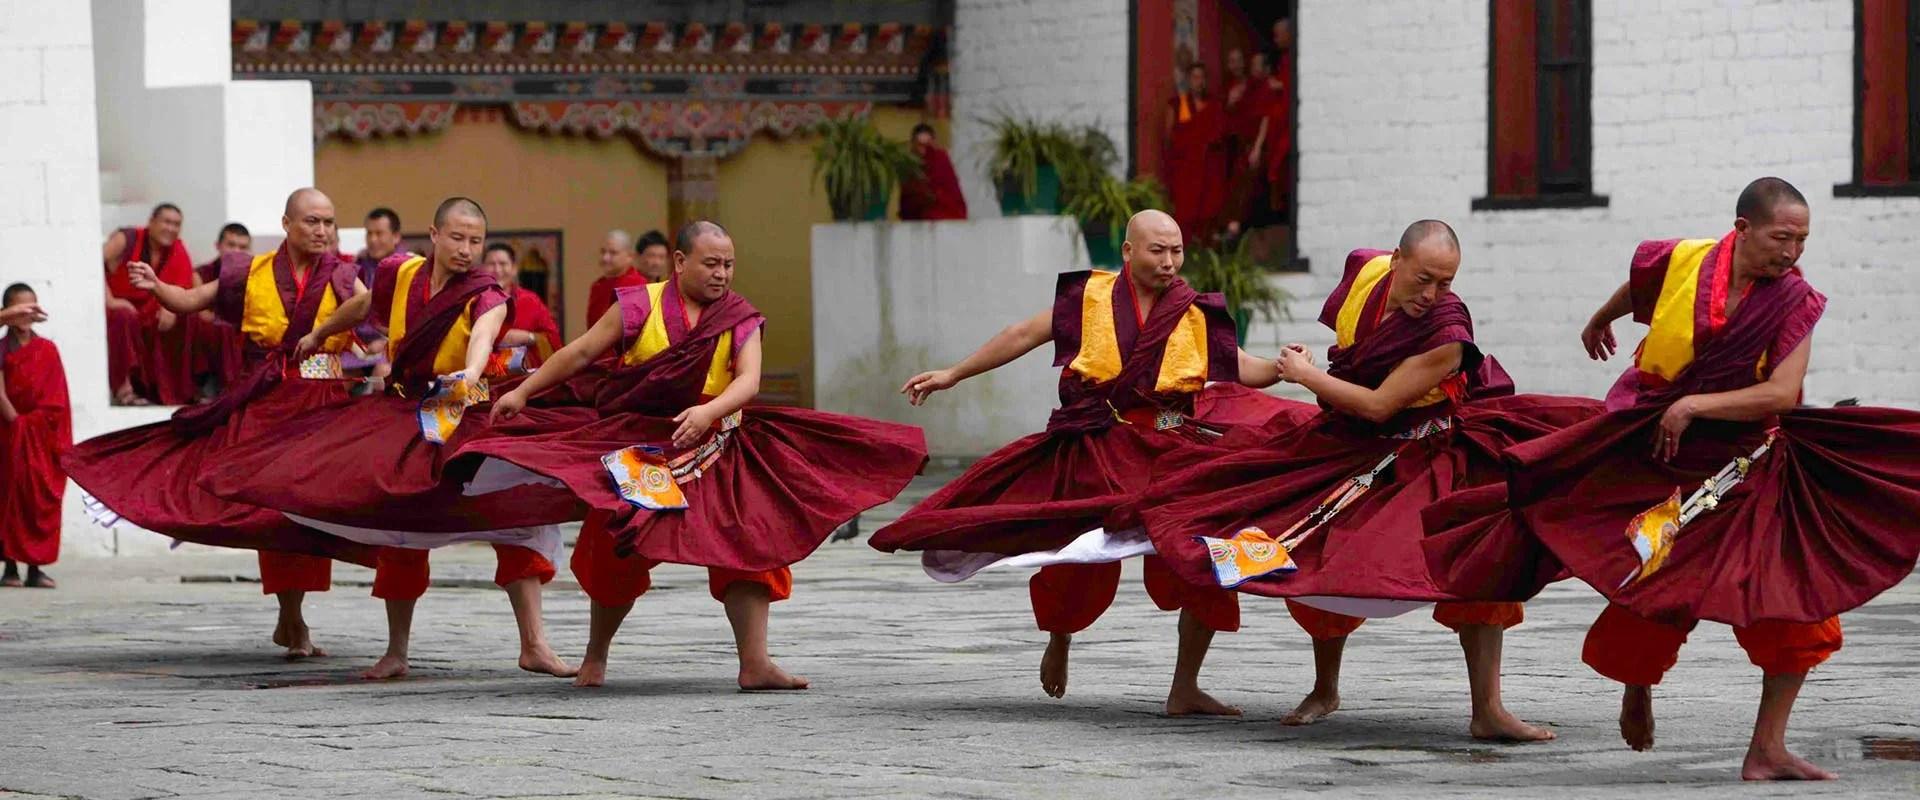 Punakha Tshechu - Bhutan Tour Agent for Bhutan Festival Tour in Punakha